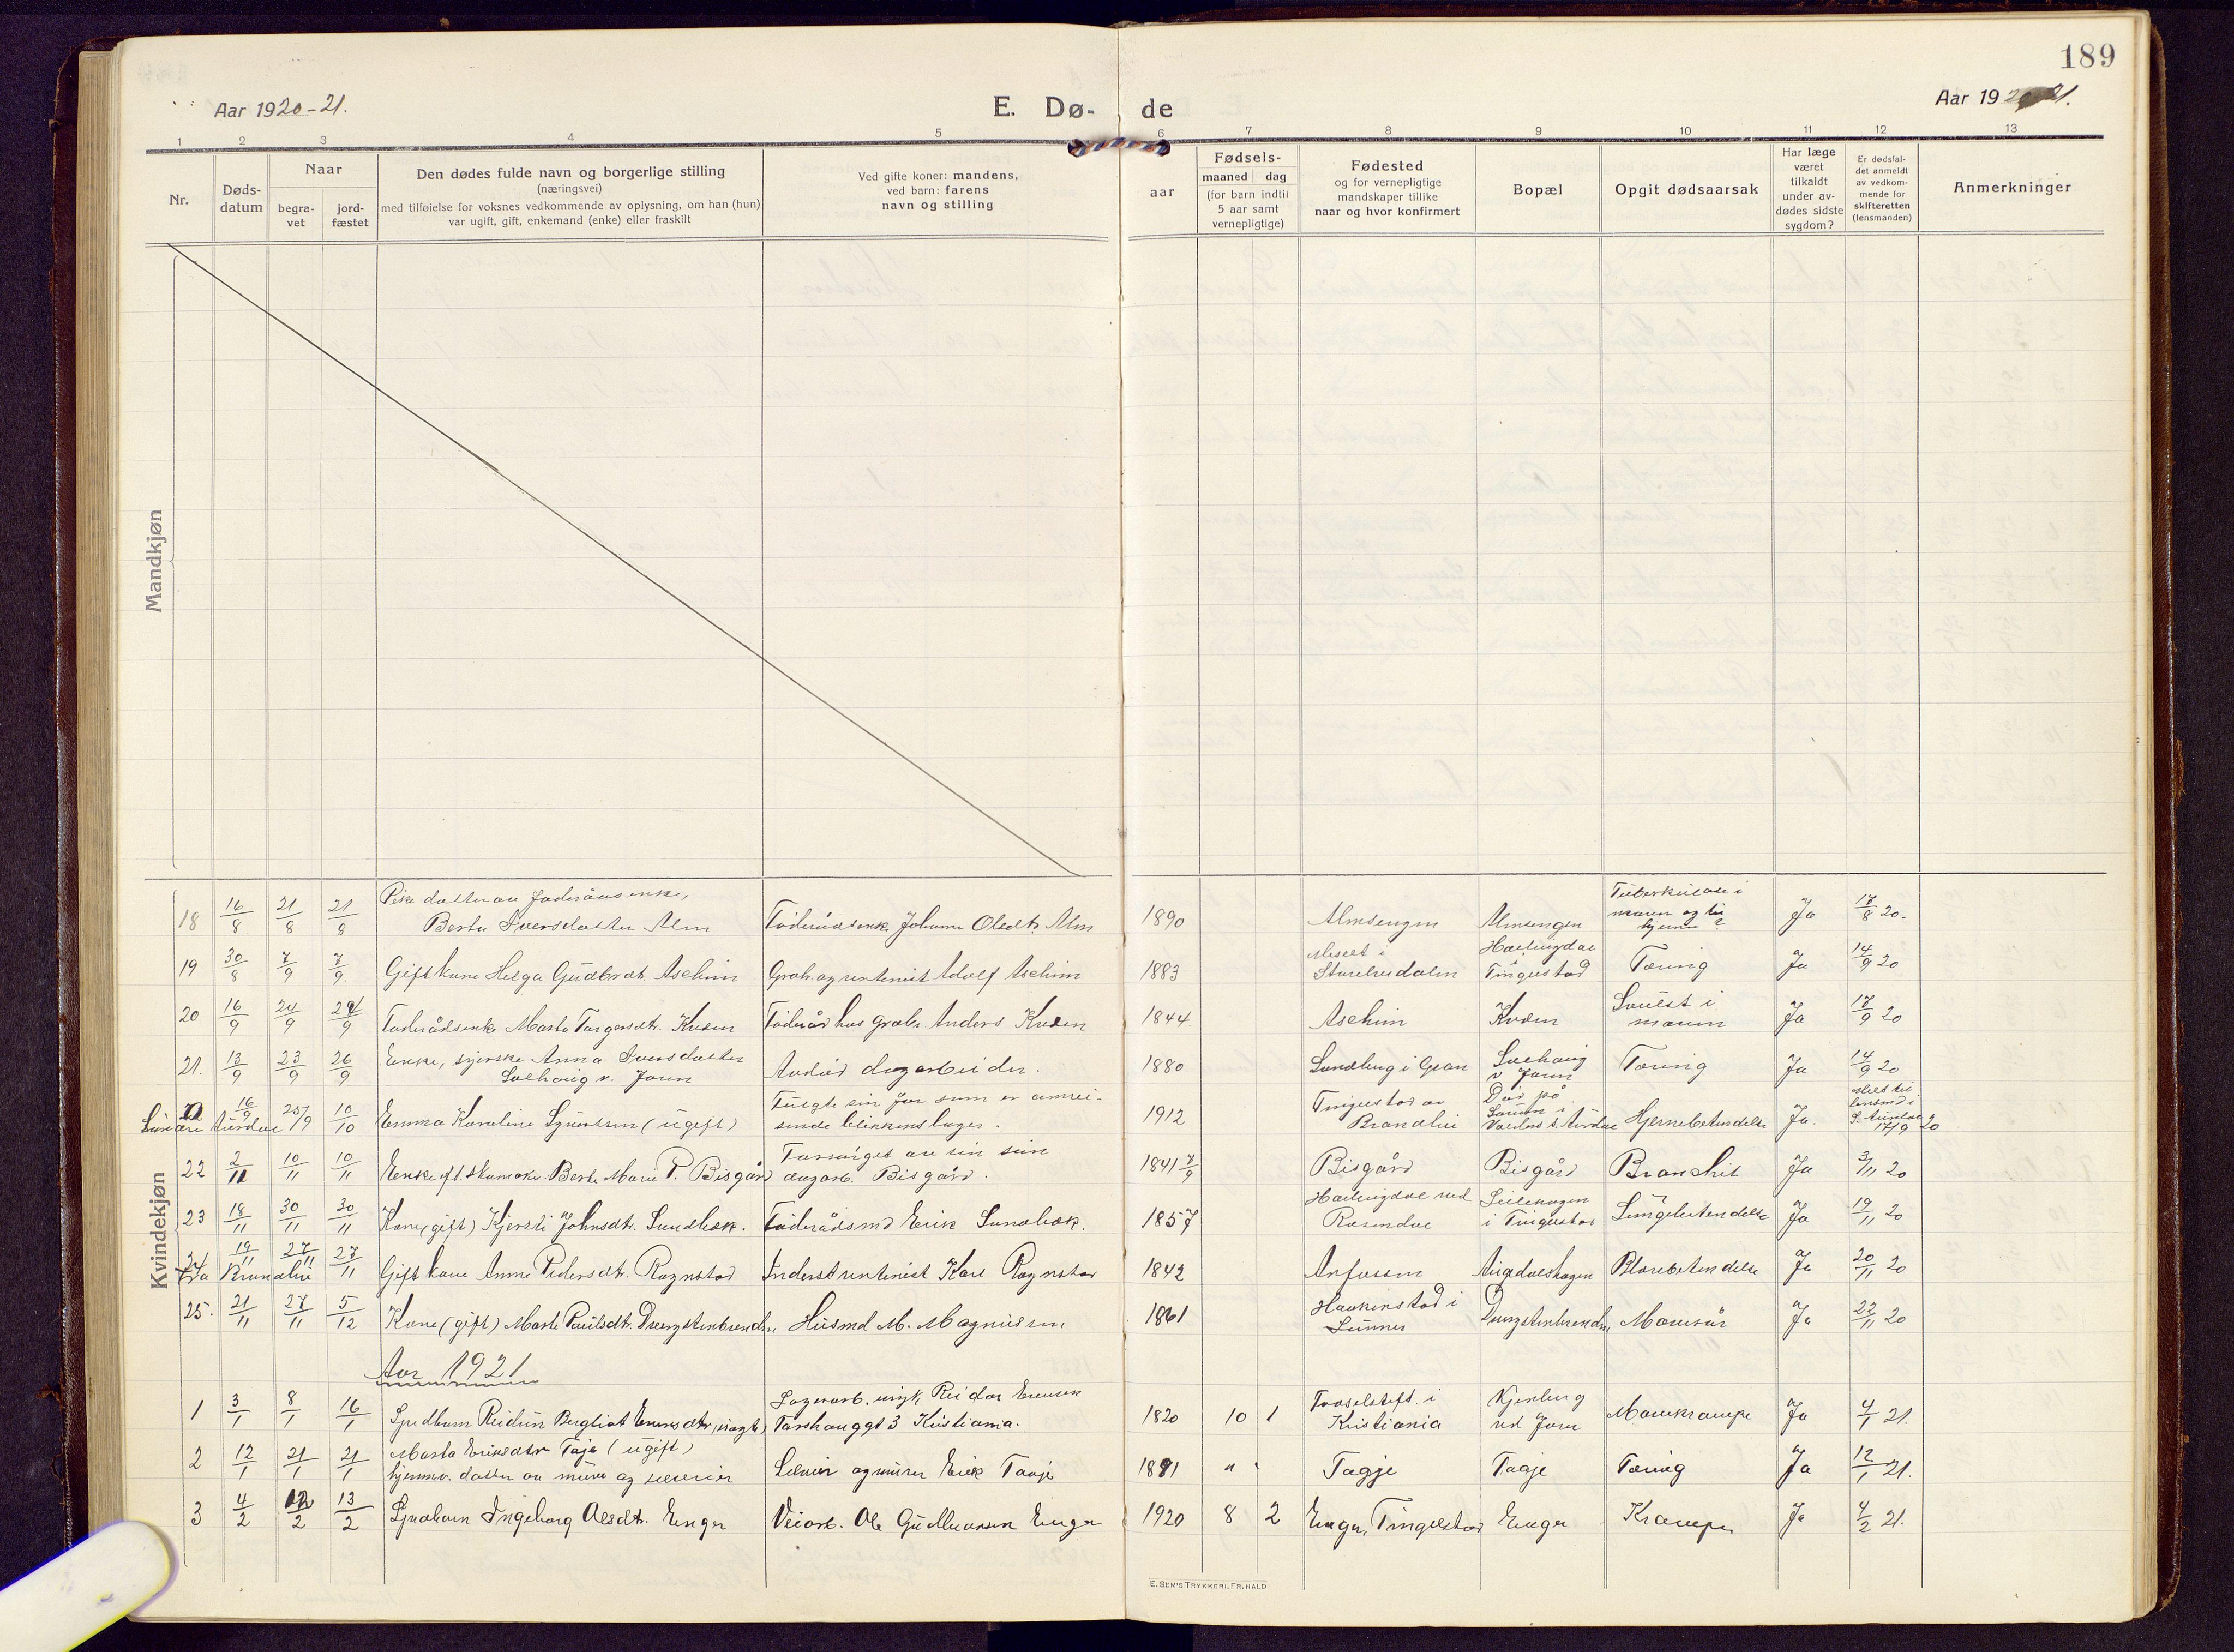 SAH, Brandbu prestekontor, Klokkerbok nr. 10, 1916-1930, s. 189